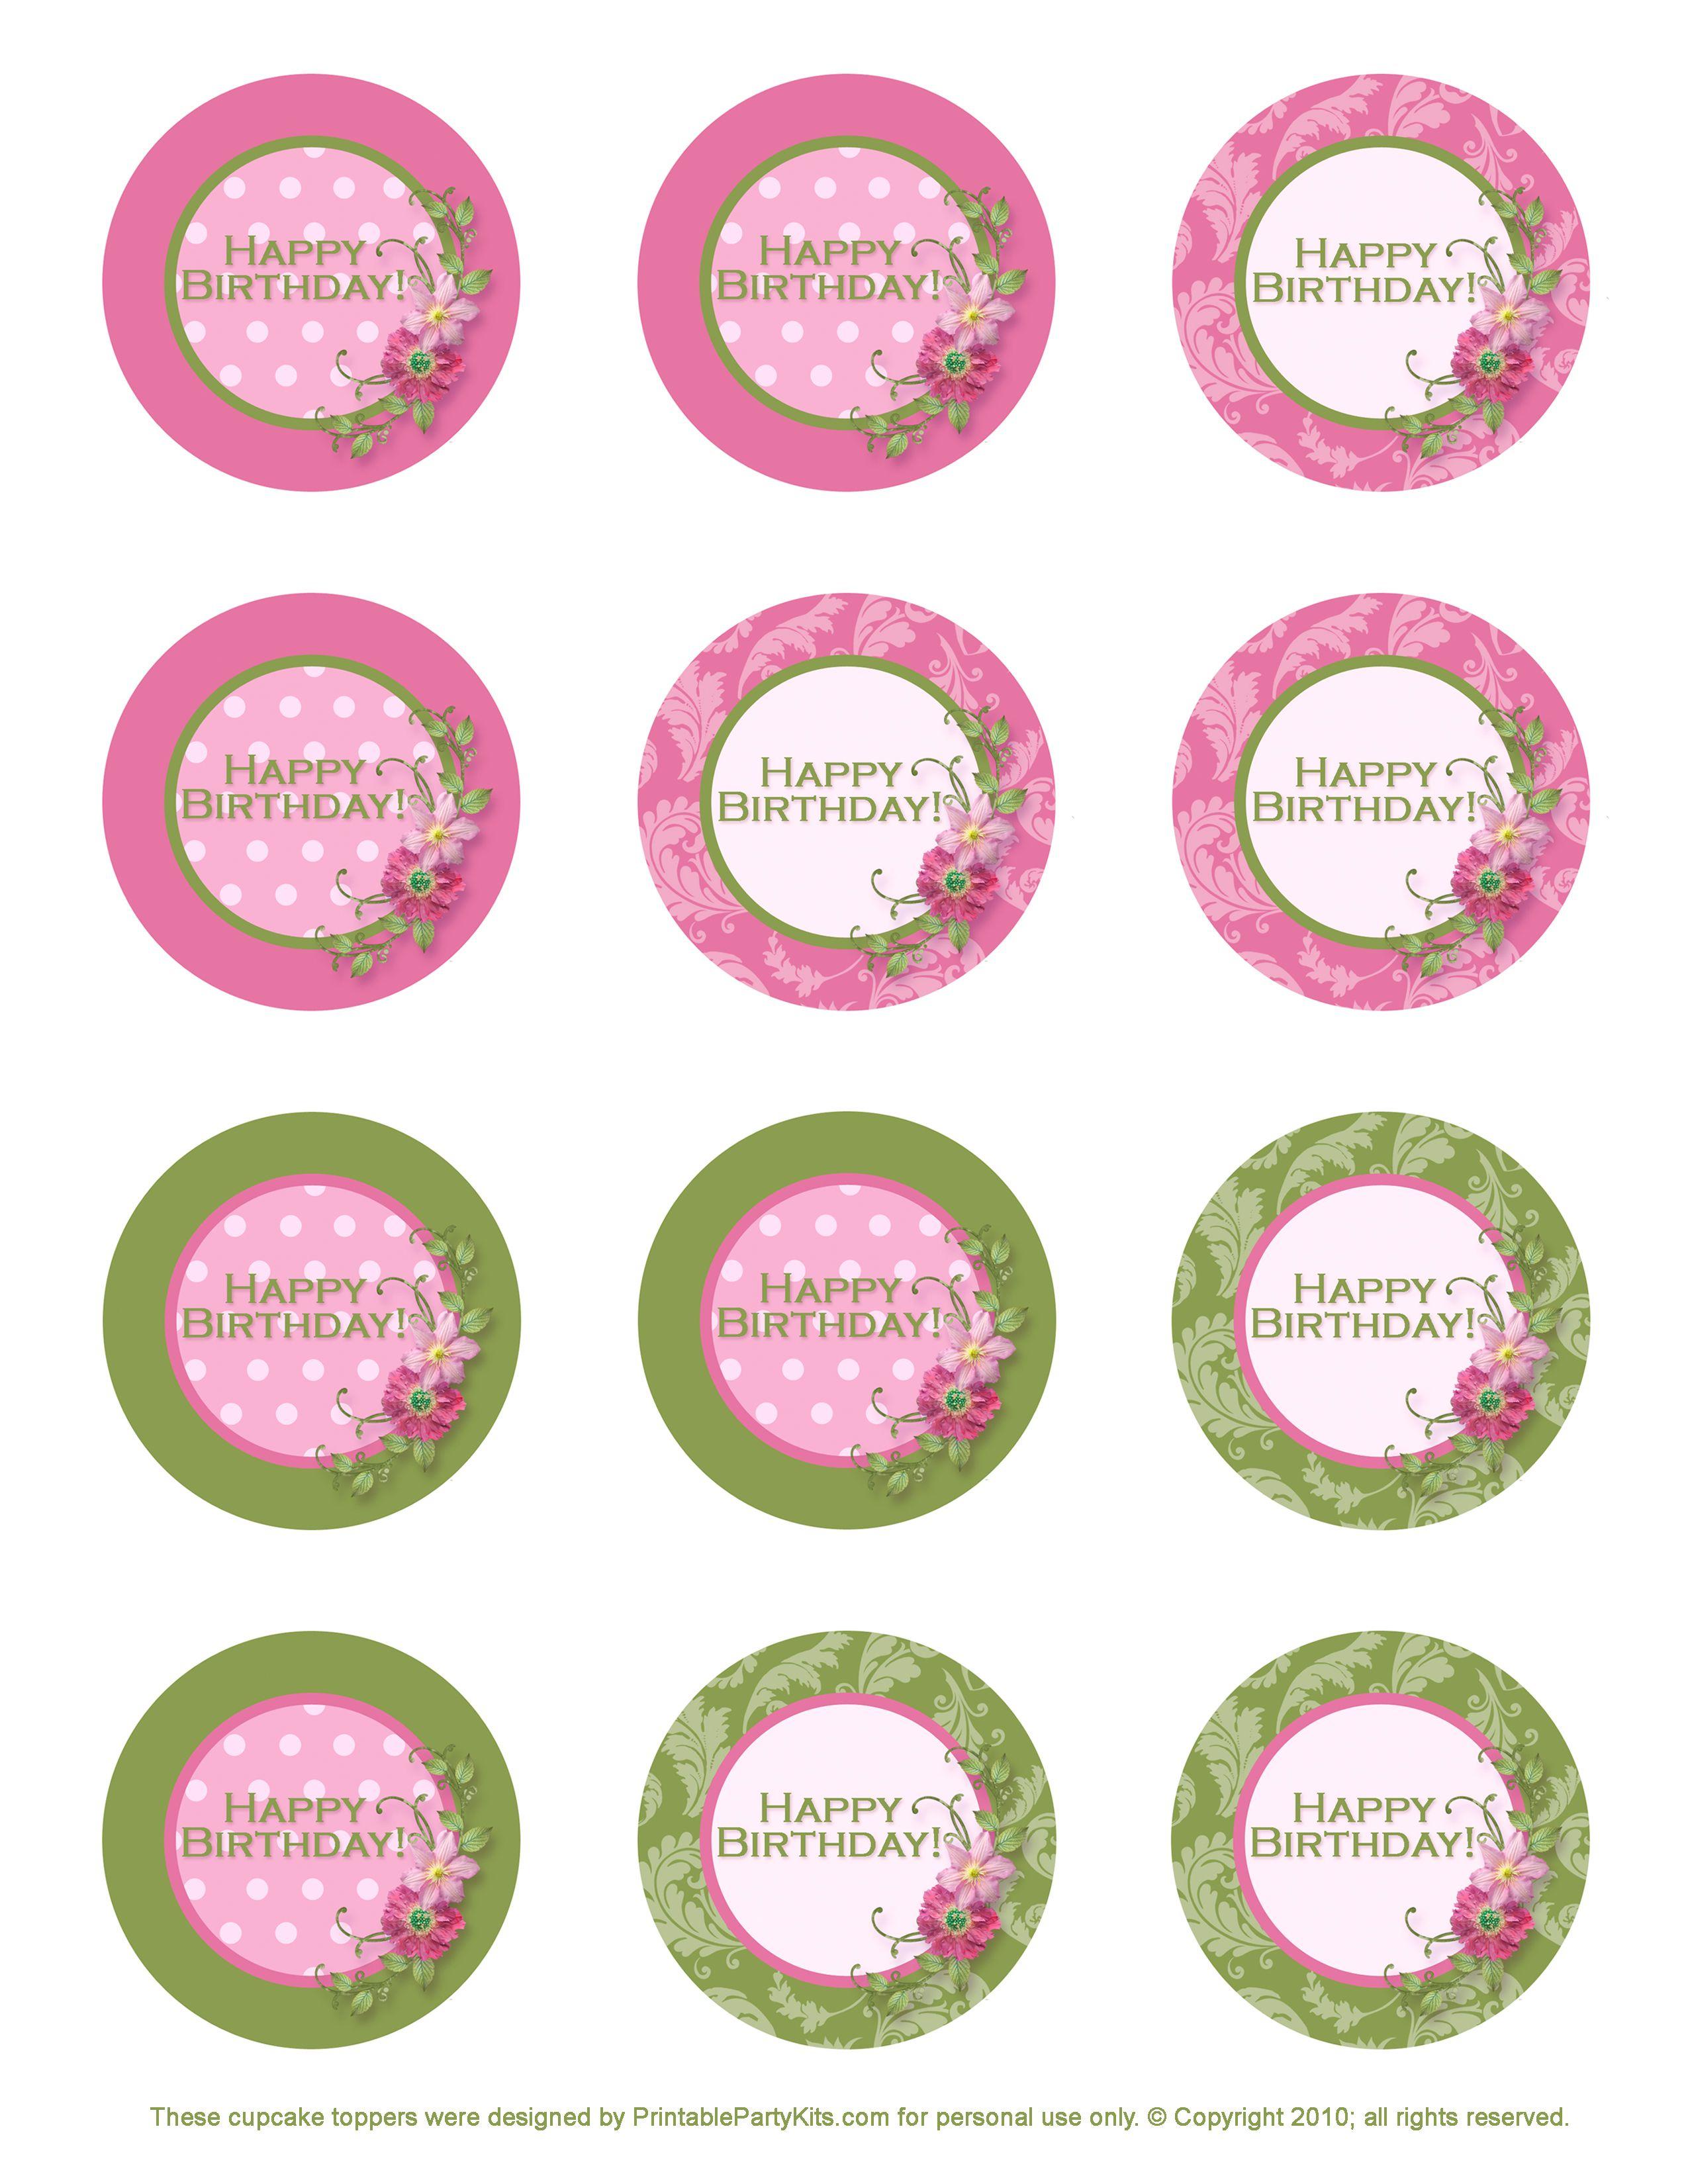 Free Printable Birthday Cupcake Toppers | Crafts | Pinterest - Cupcake Flags Printable Free